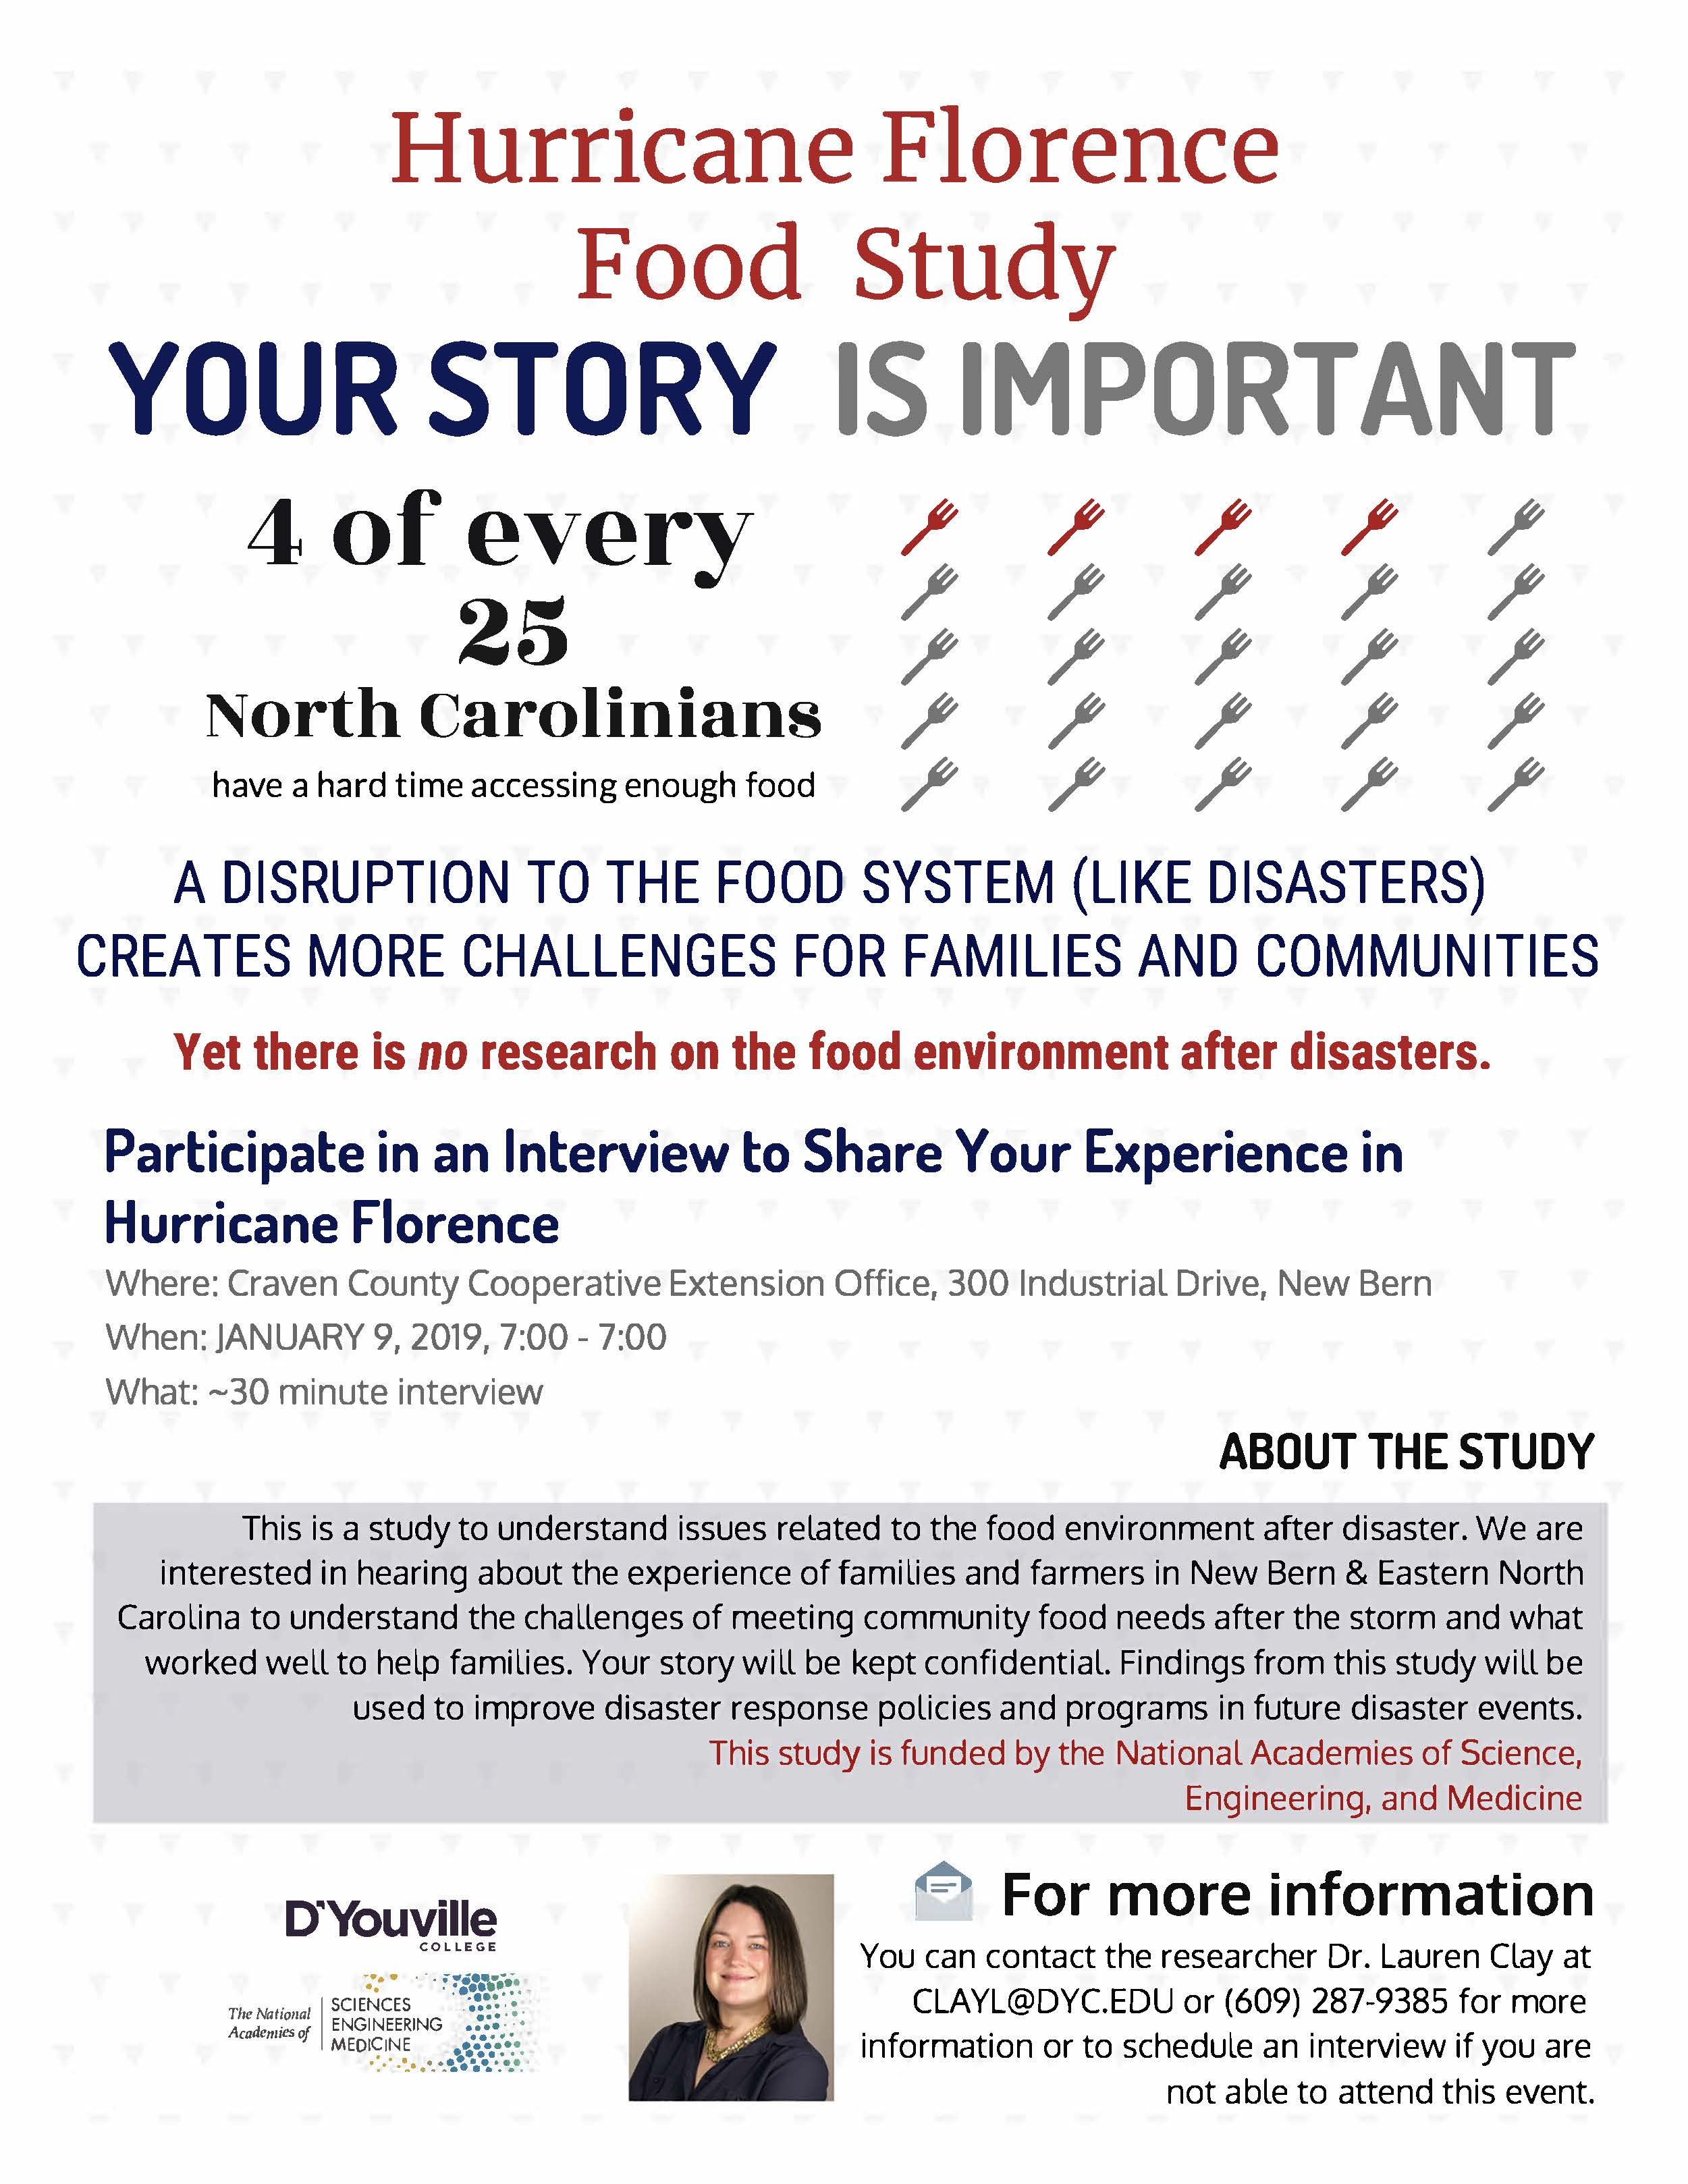 Food study flyer image